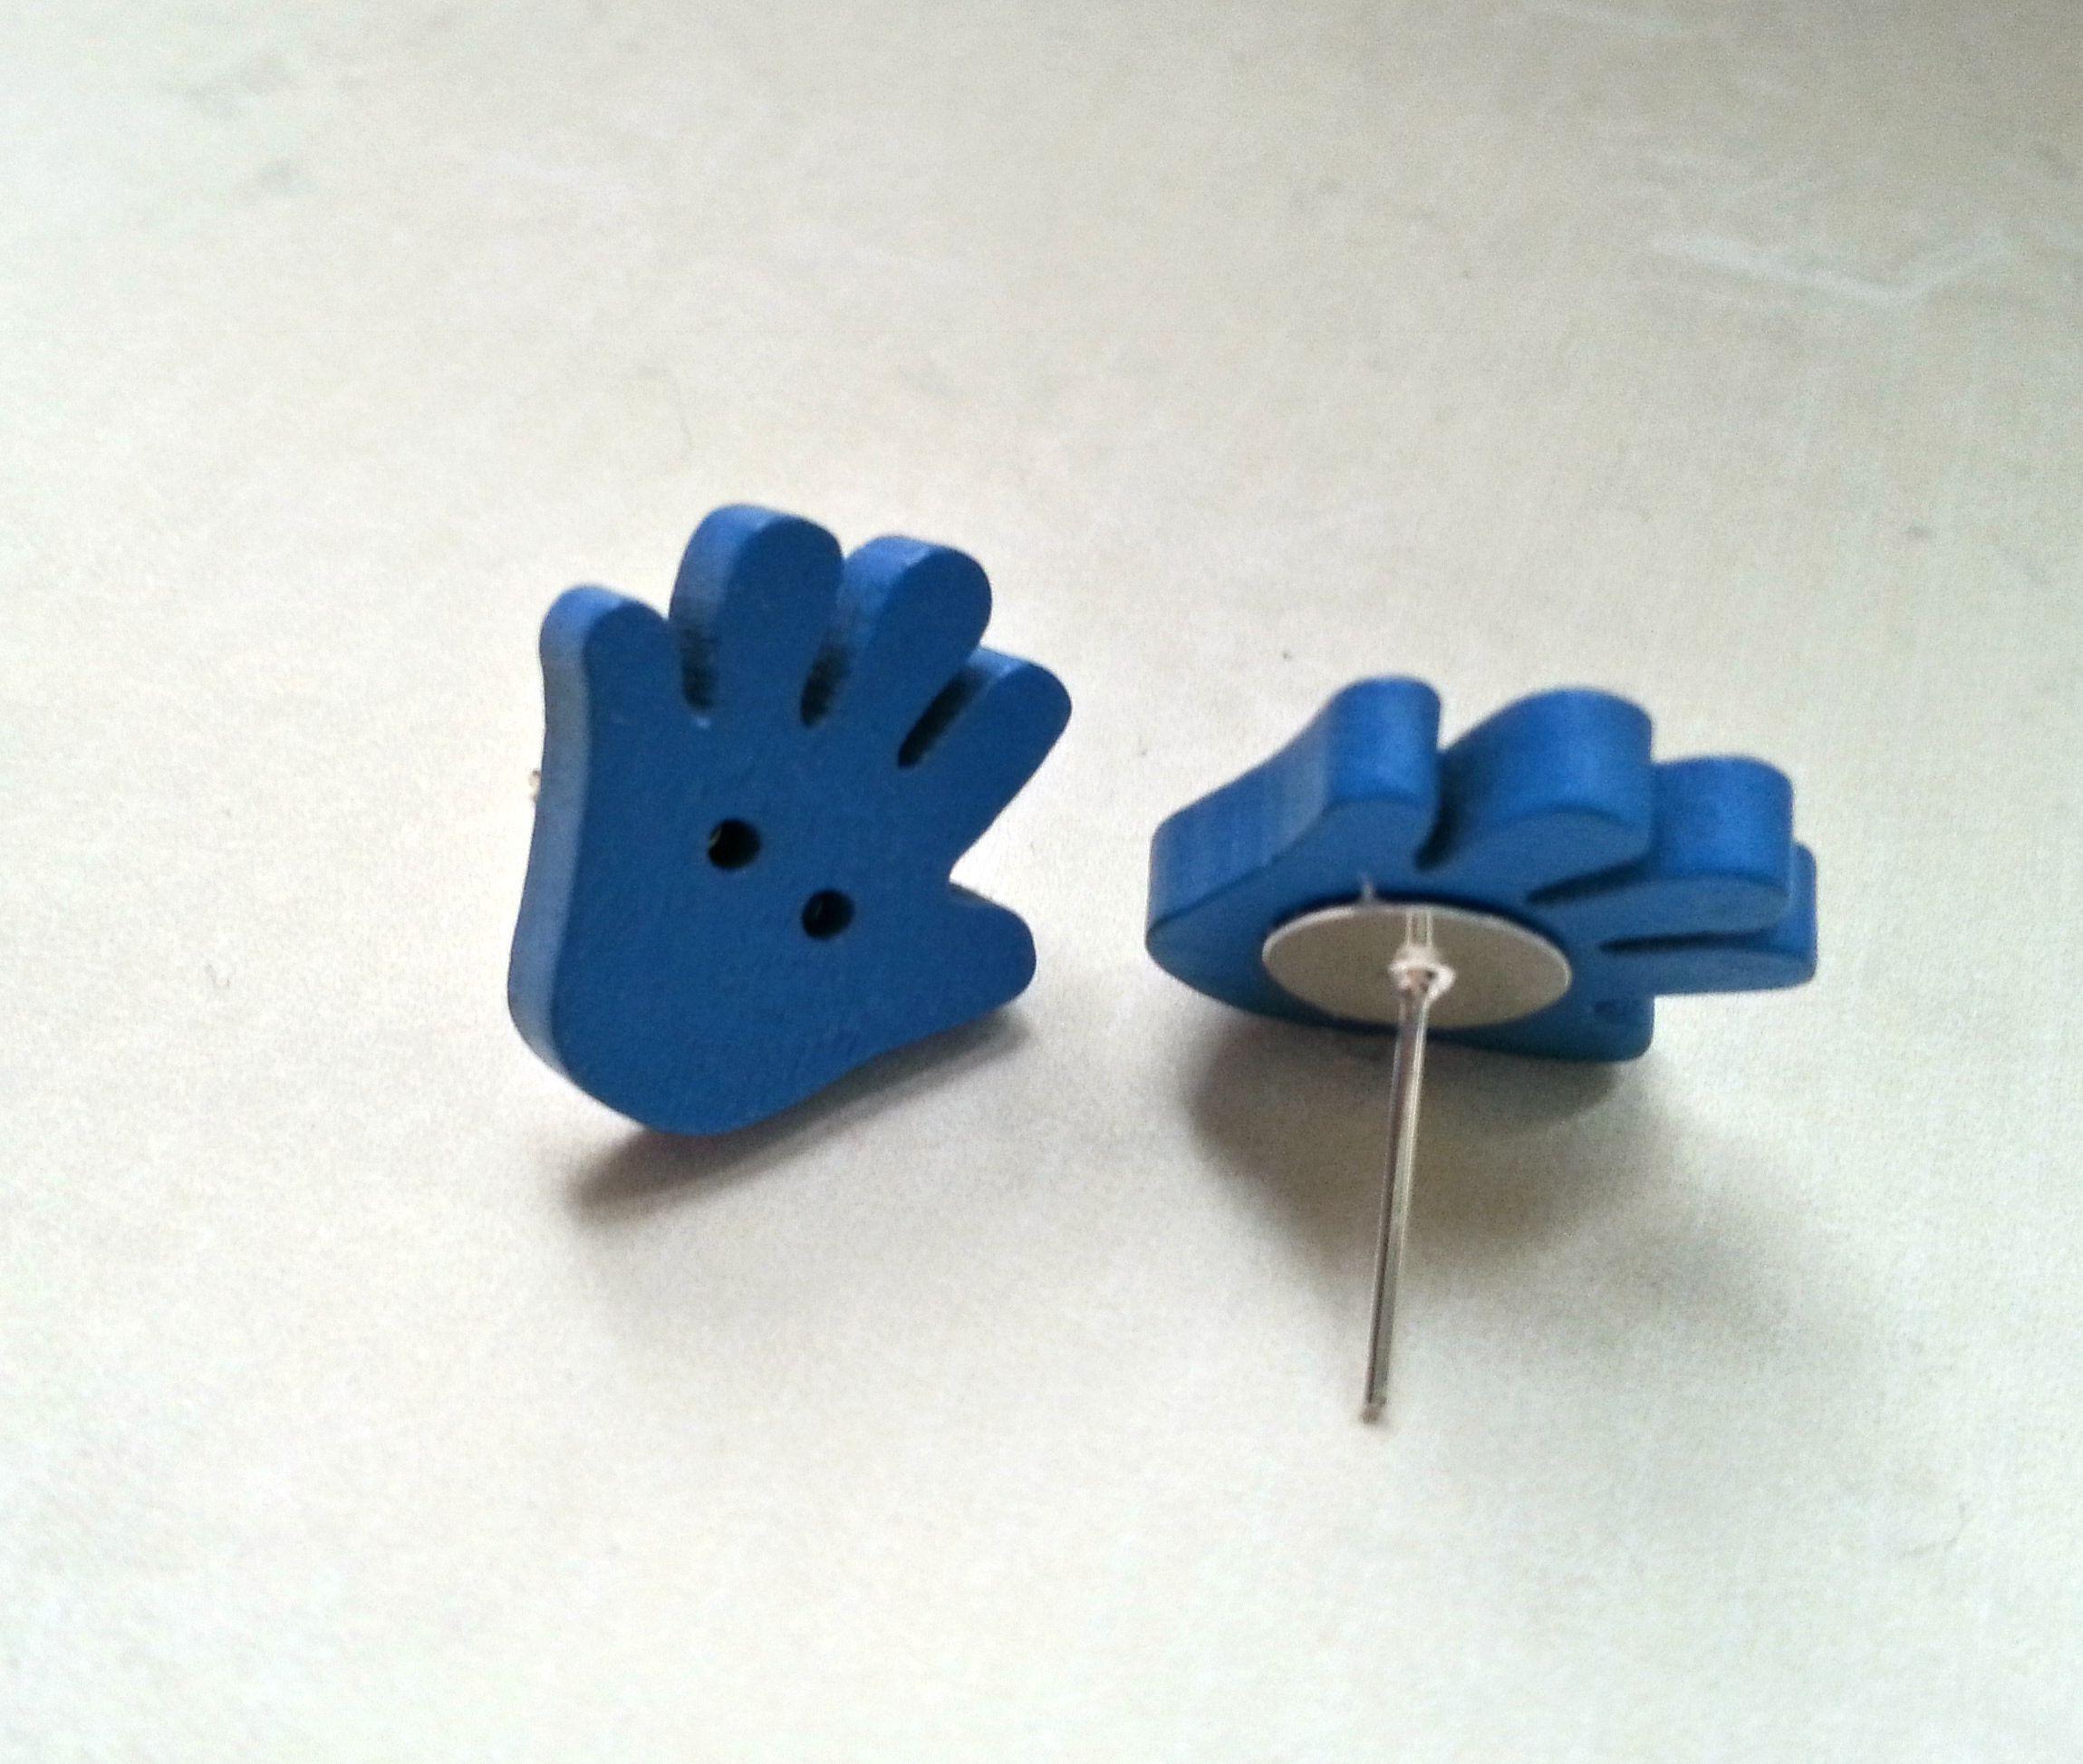 Ohrstecker Holzknopf Hand blau Holz  http://de.dawanda.com/product/73739723-Ohrstecker-Holzknopf-Hand-blau-Holz